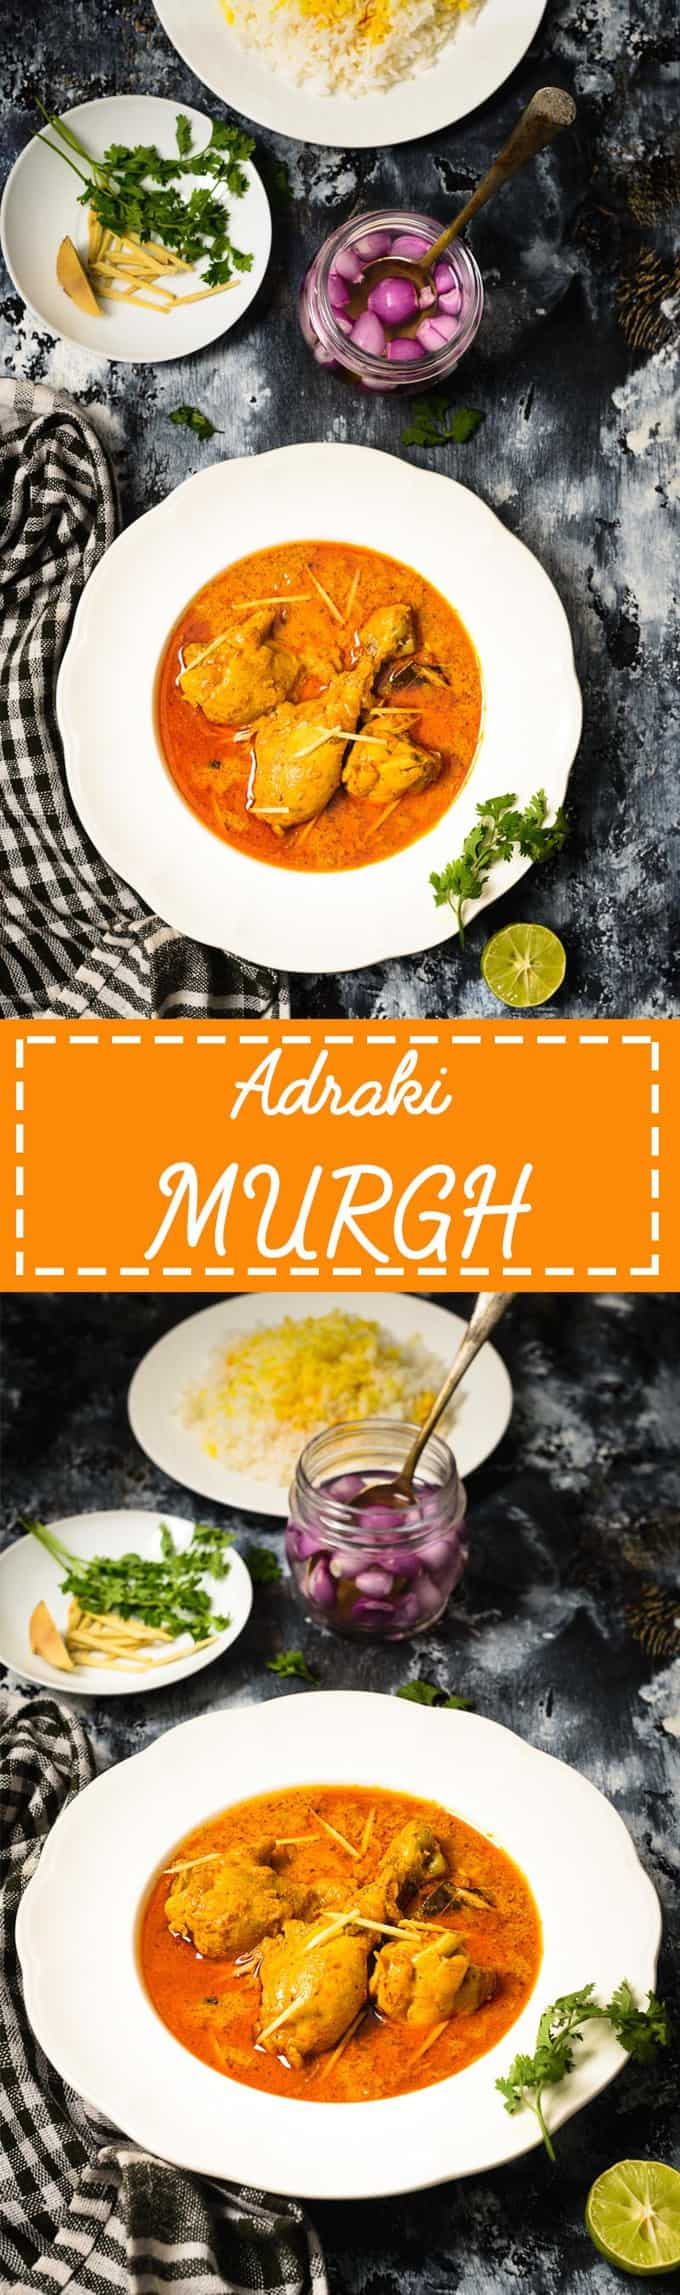 Adraki Murgh